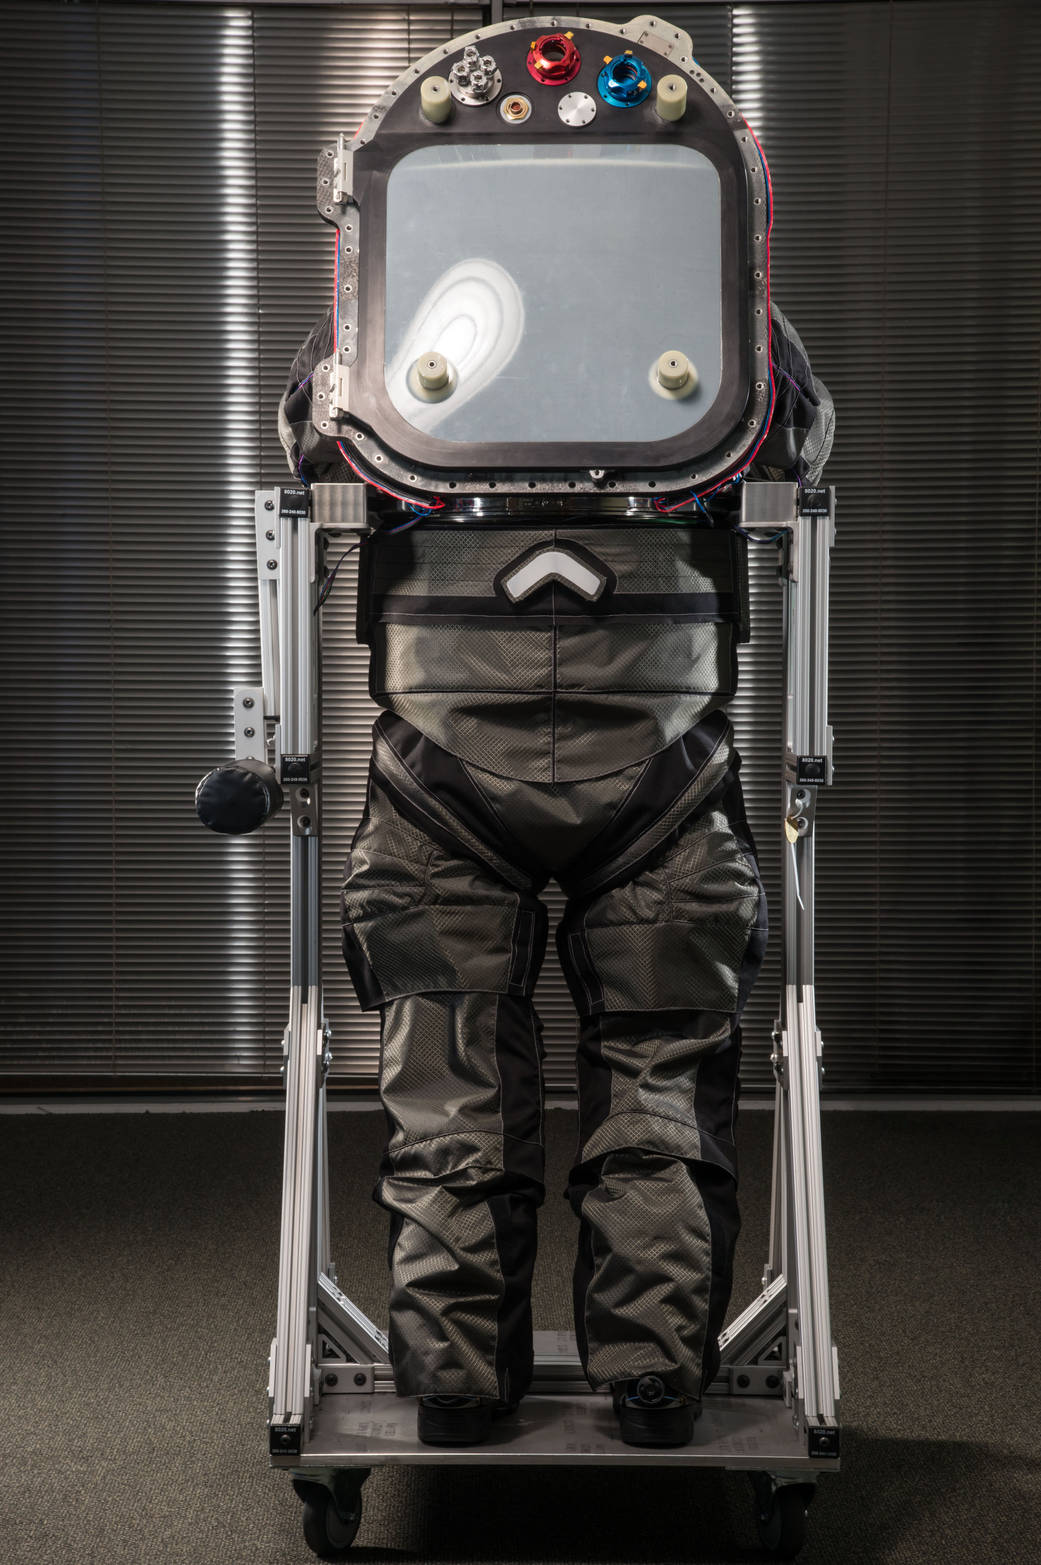 New spacesuit via NASA